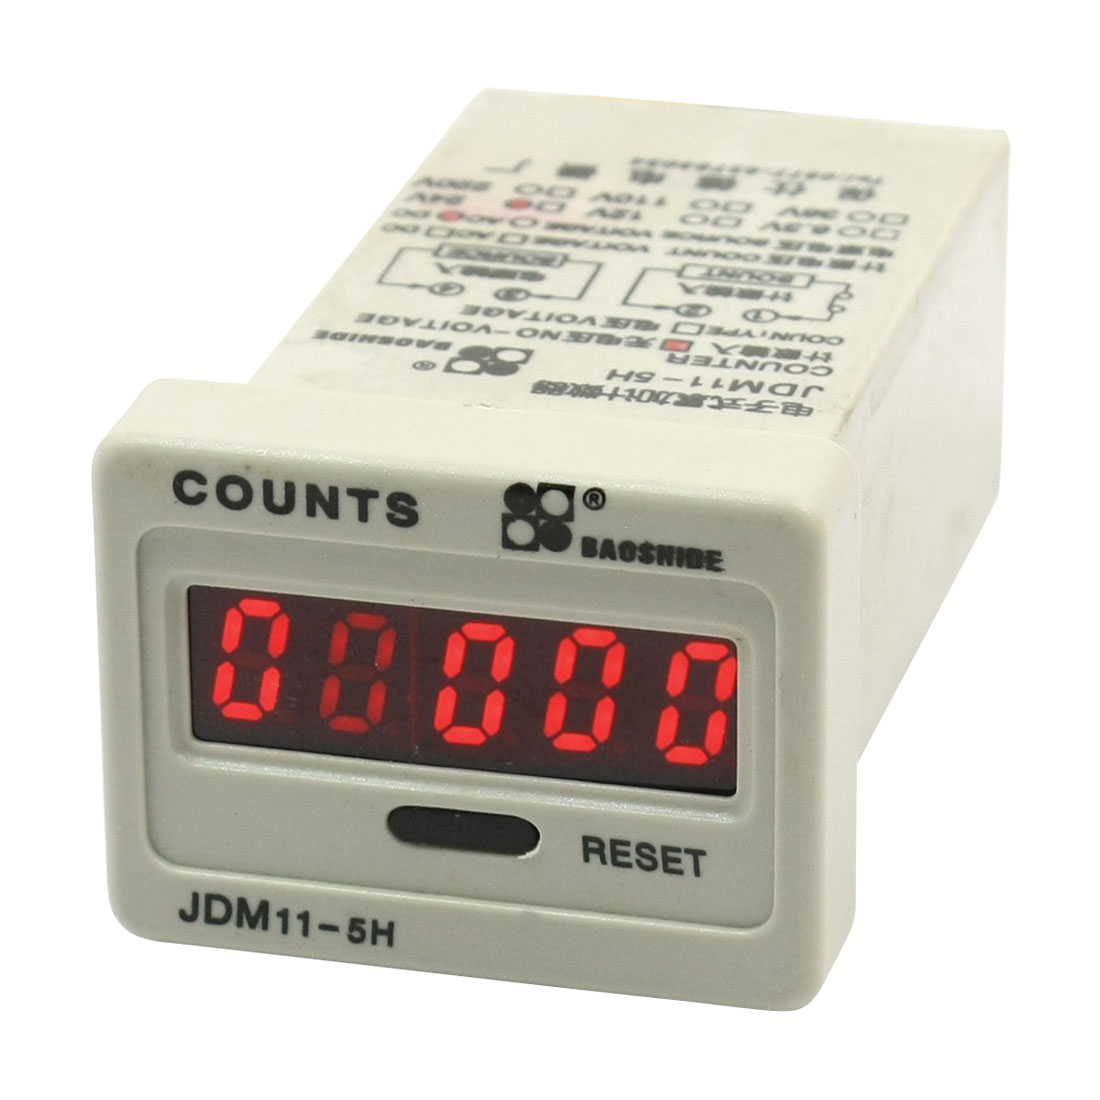 JDM11-5H DC 24V 5 Digits No-Voltage Input LED Display Accumulating Counter